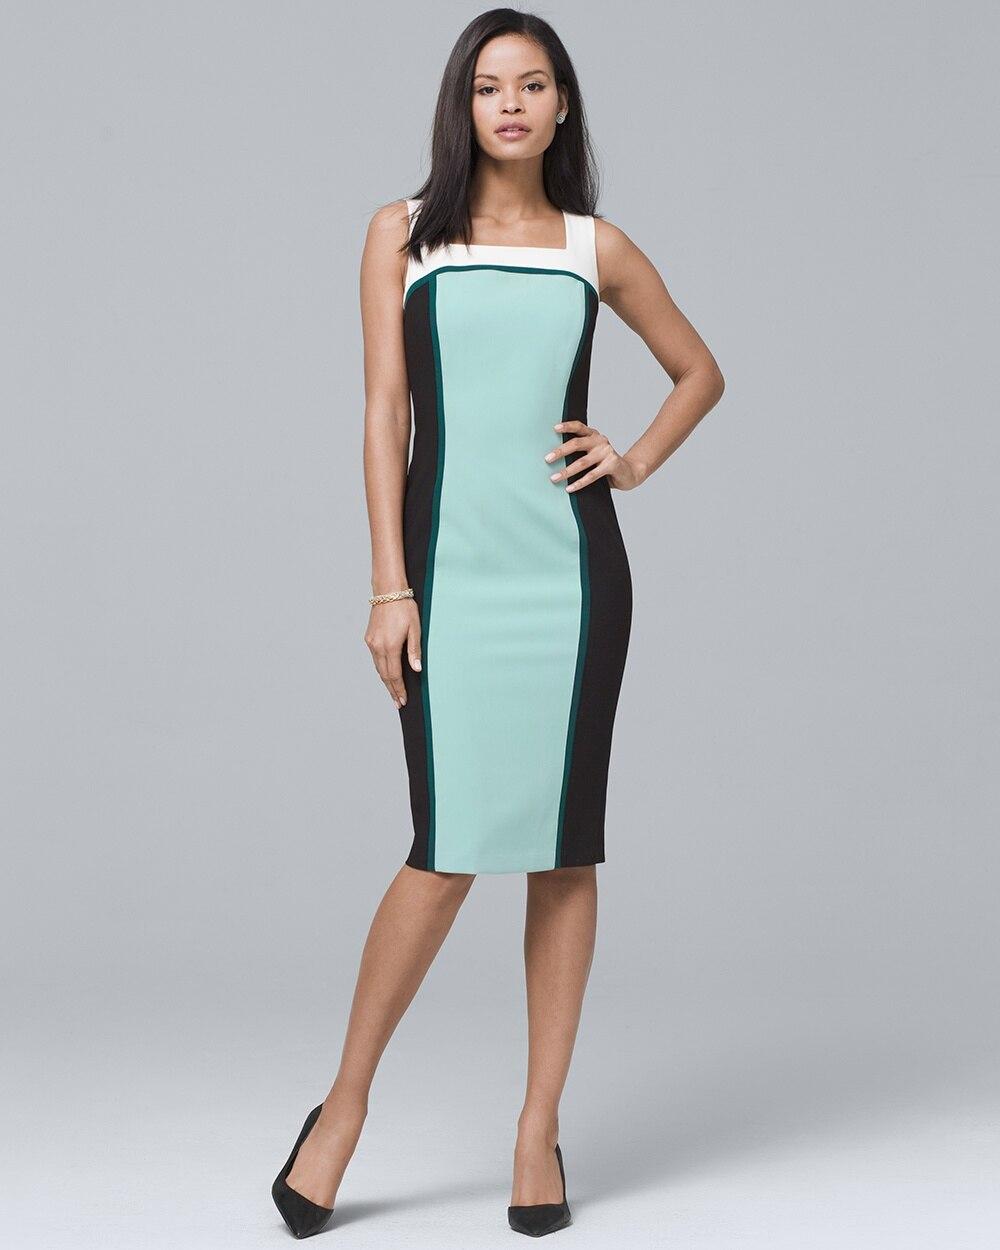 White House Black Market Colorblock Dress